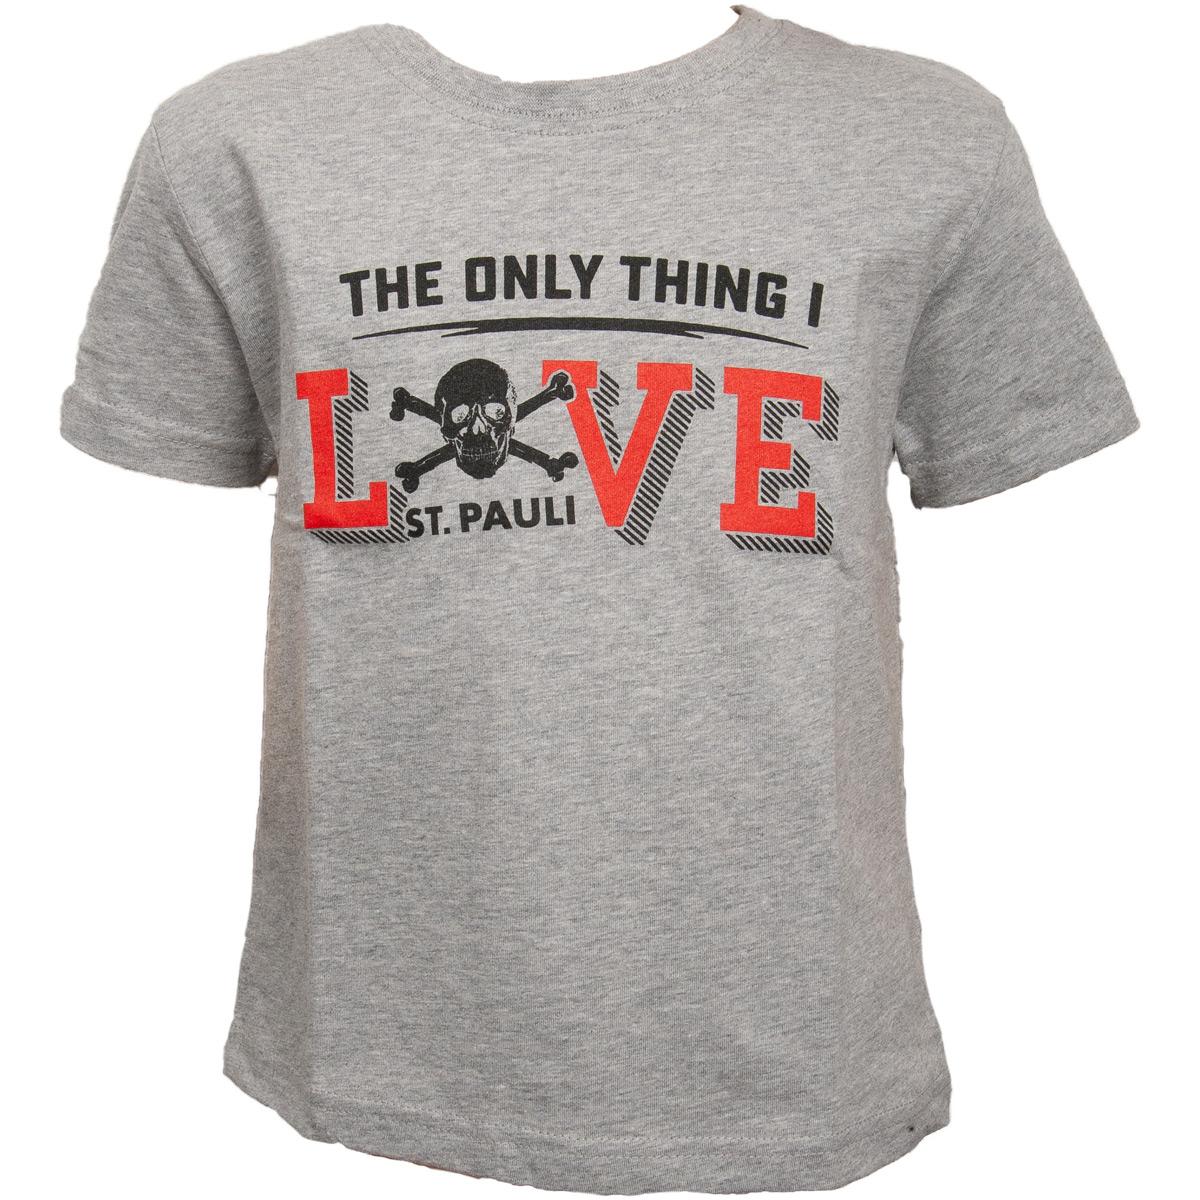 FC St. Pauli - Kinder T-Shirt Love - grau